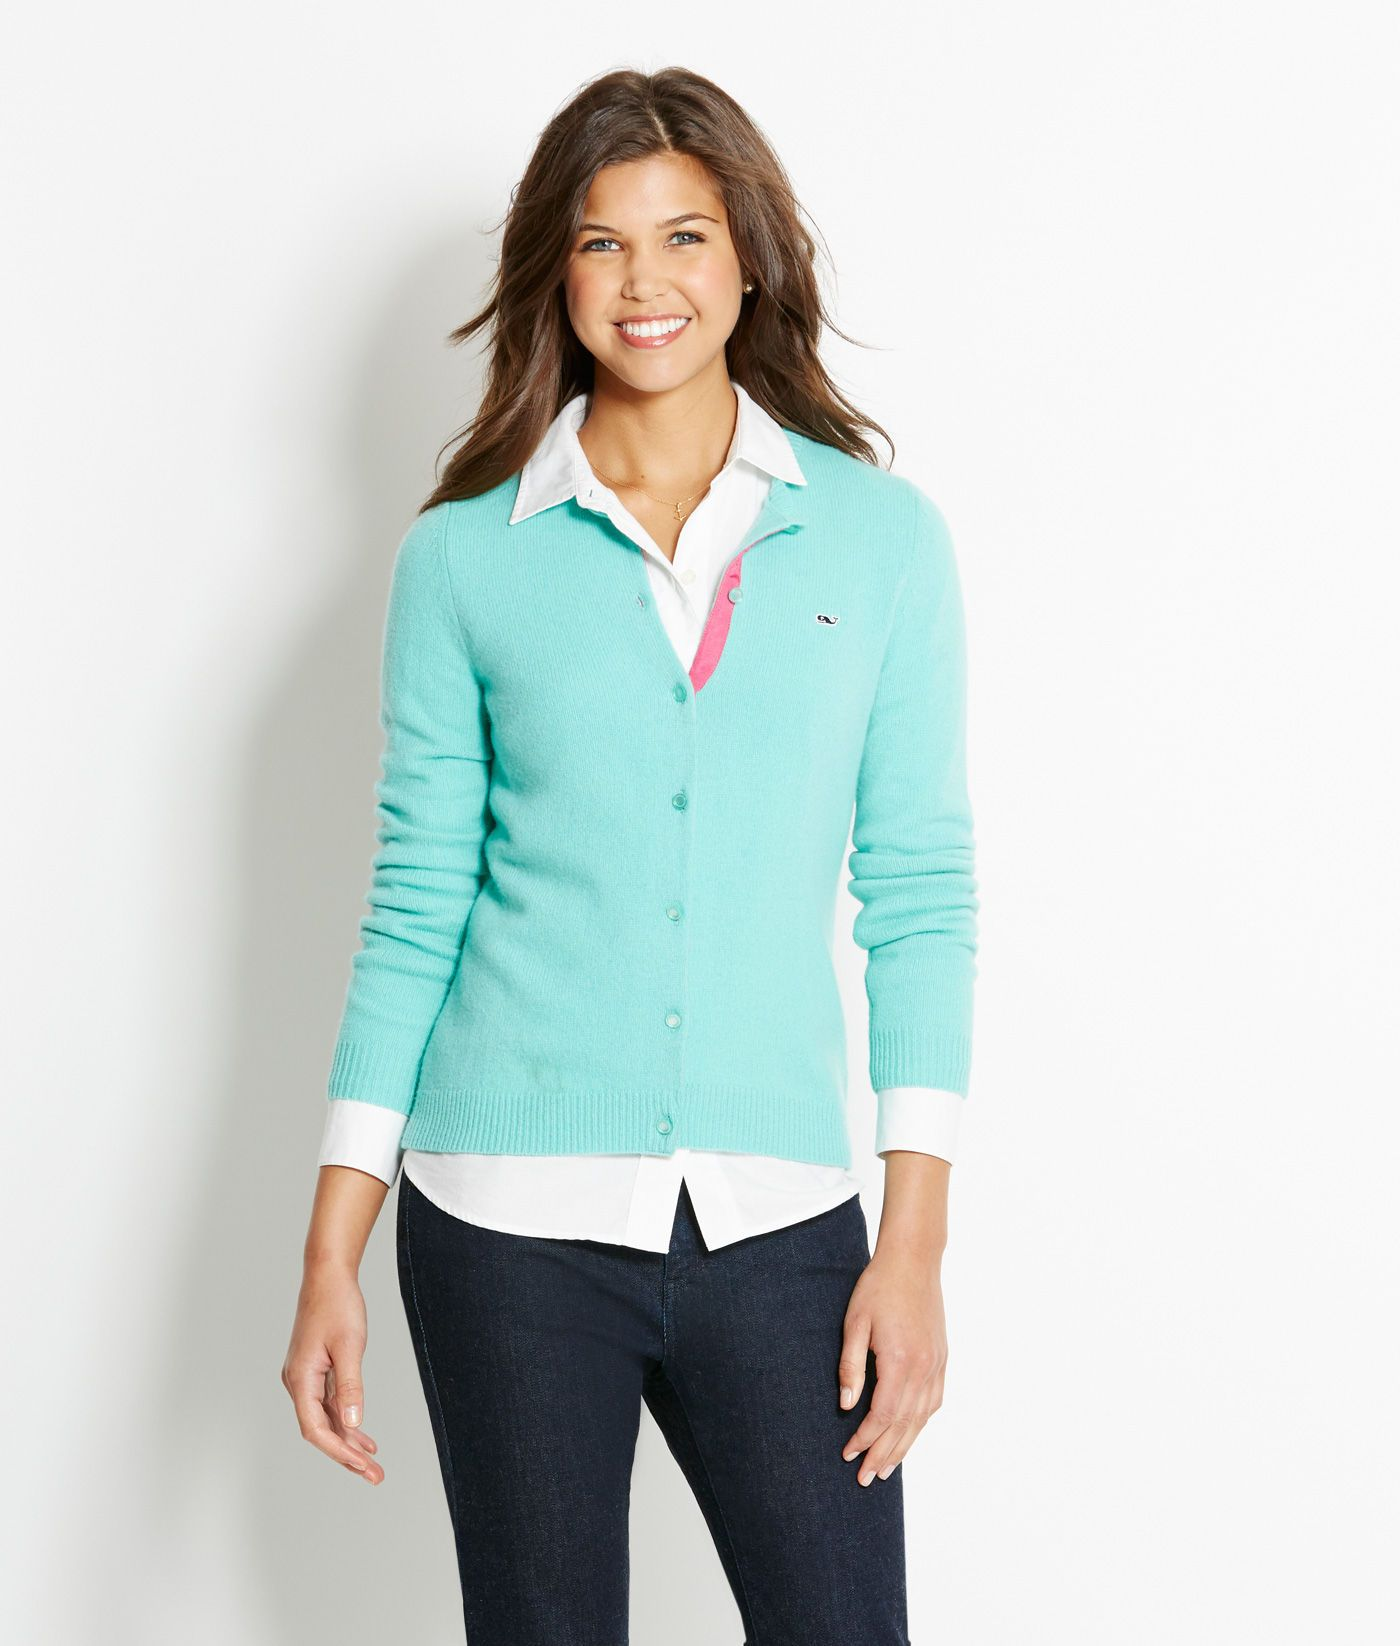 Shop Sweaters: Shetland Cardigan for Women | Vineyard Vines | My ...